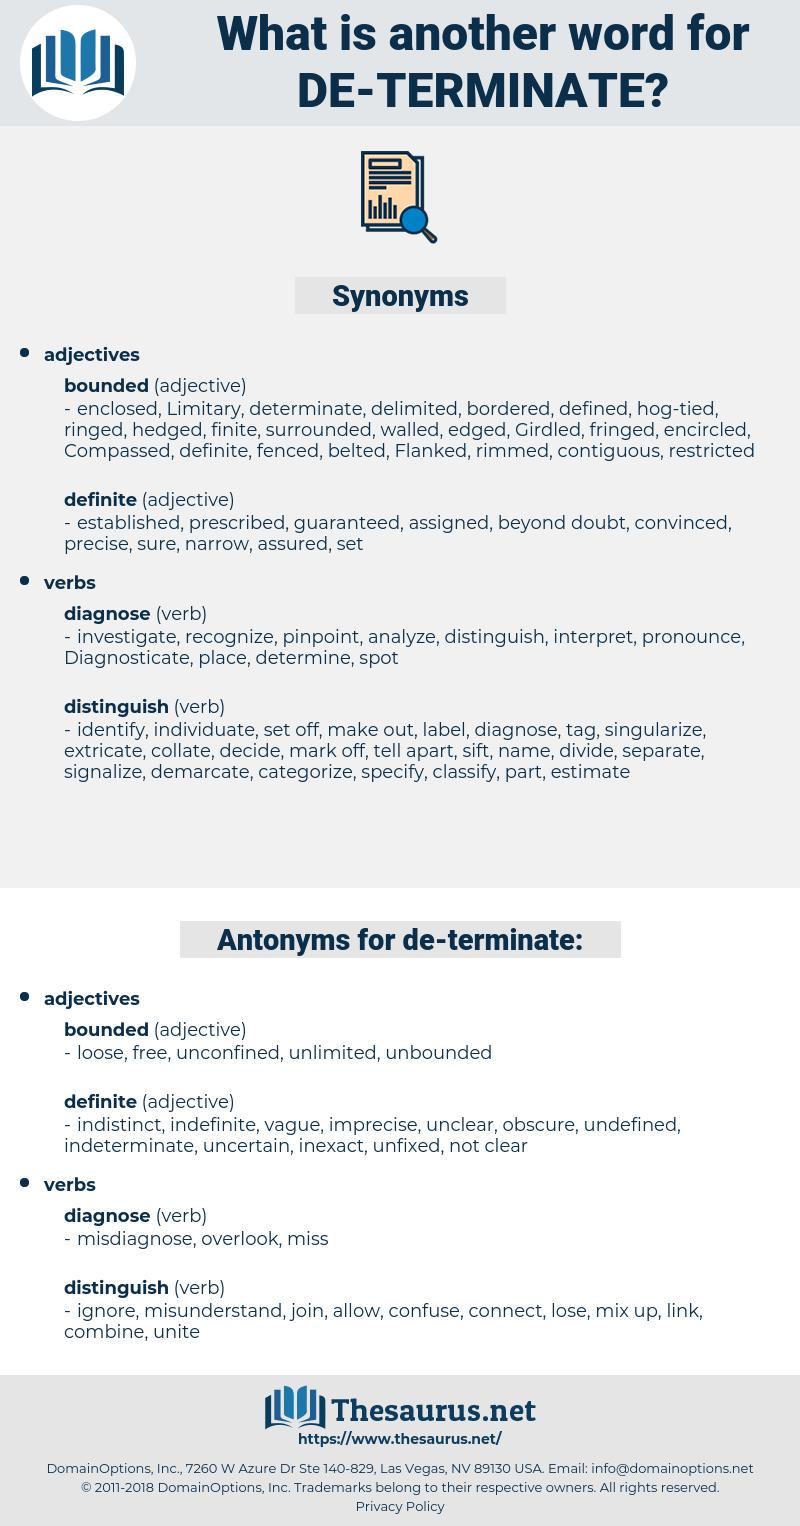 de terminate, synonym de terminate, another word for de terminate, words like de terminate, thesaurus de terminate